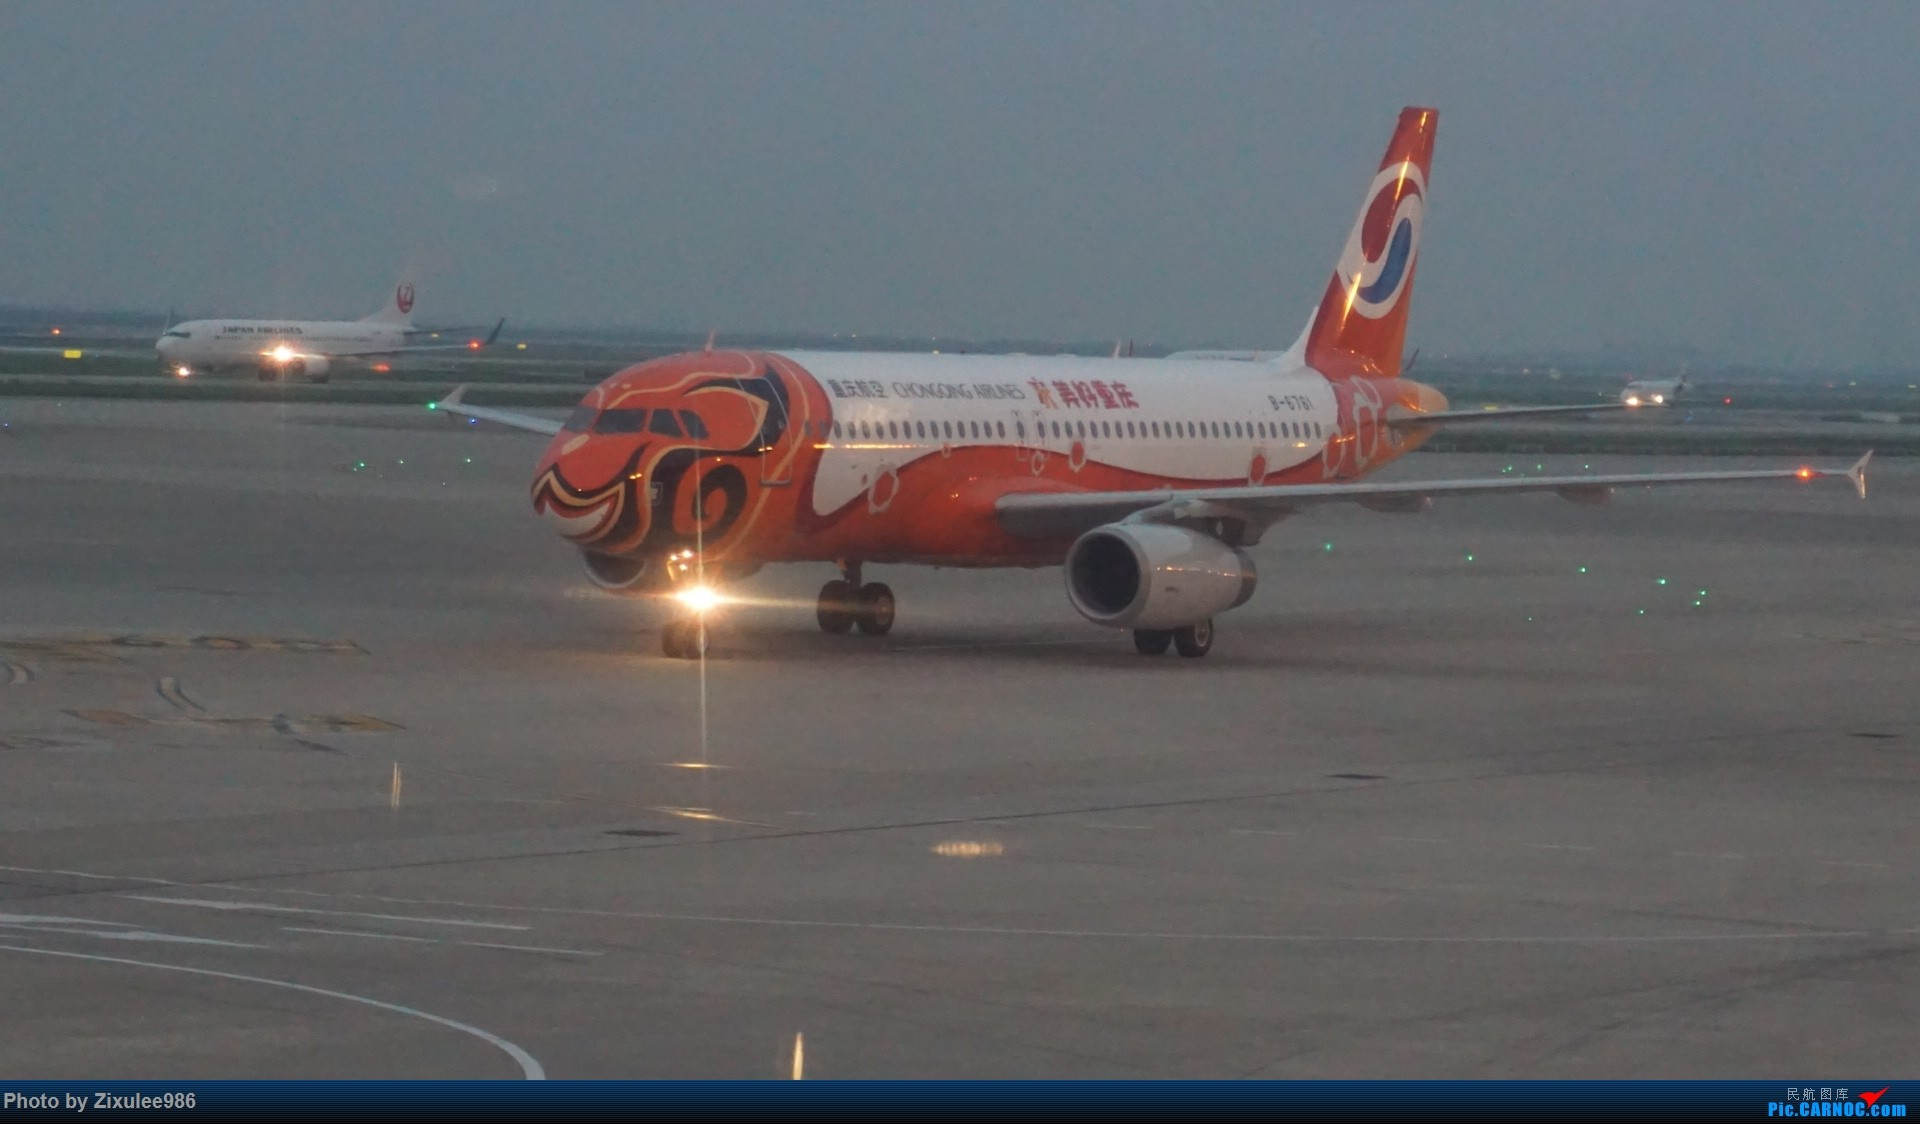 Re:[原创]加拿大21日游学之旅 (二)~加航AC28..PVG-YYZ到达多村后的雨天~多图缓更,请各位大侠谅解~ AIRBUS A320-232 B-6761 中国上海浦东国际机场